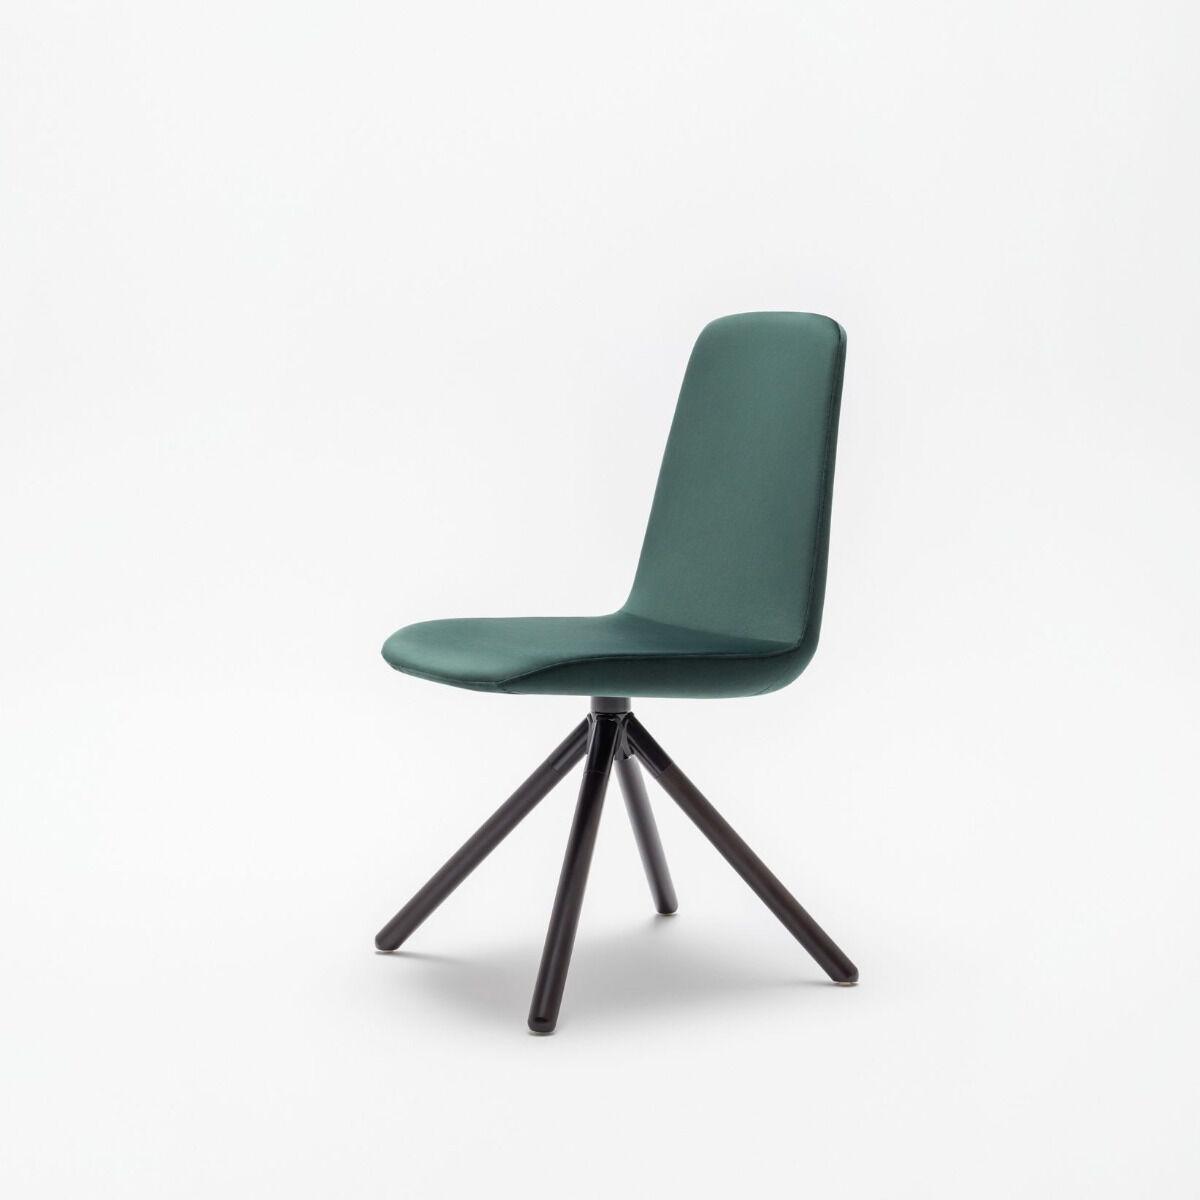 Ulti chair Fabric: Xtreme Colour: Xr430  Base colour:  M115